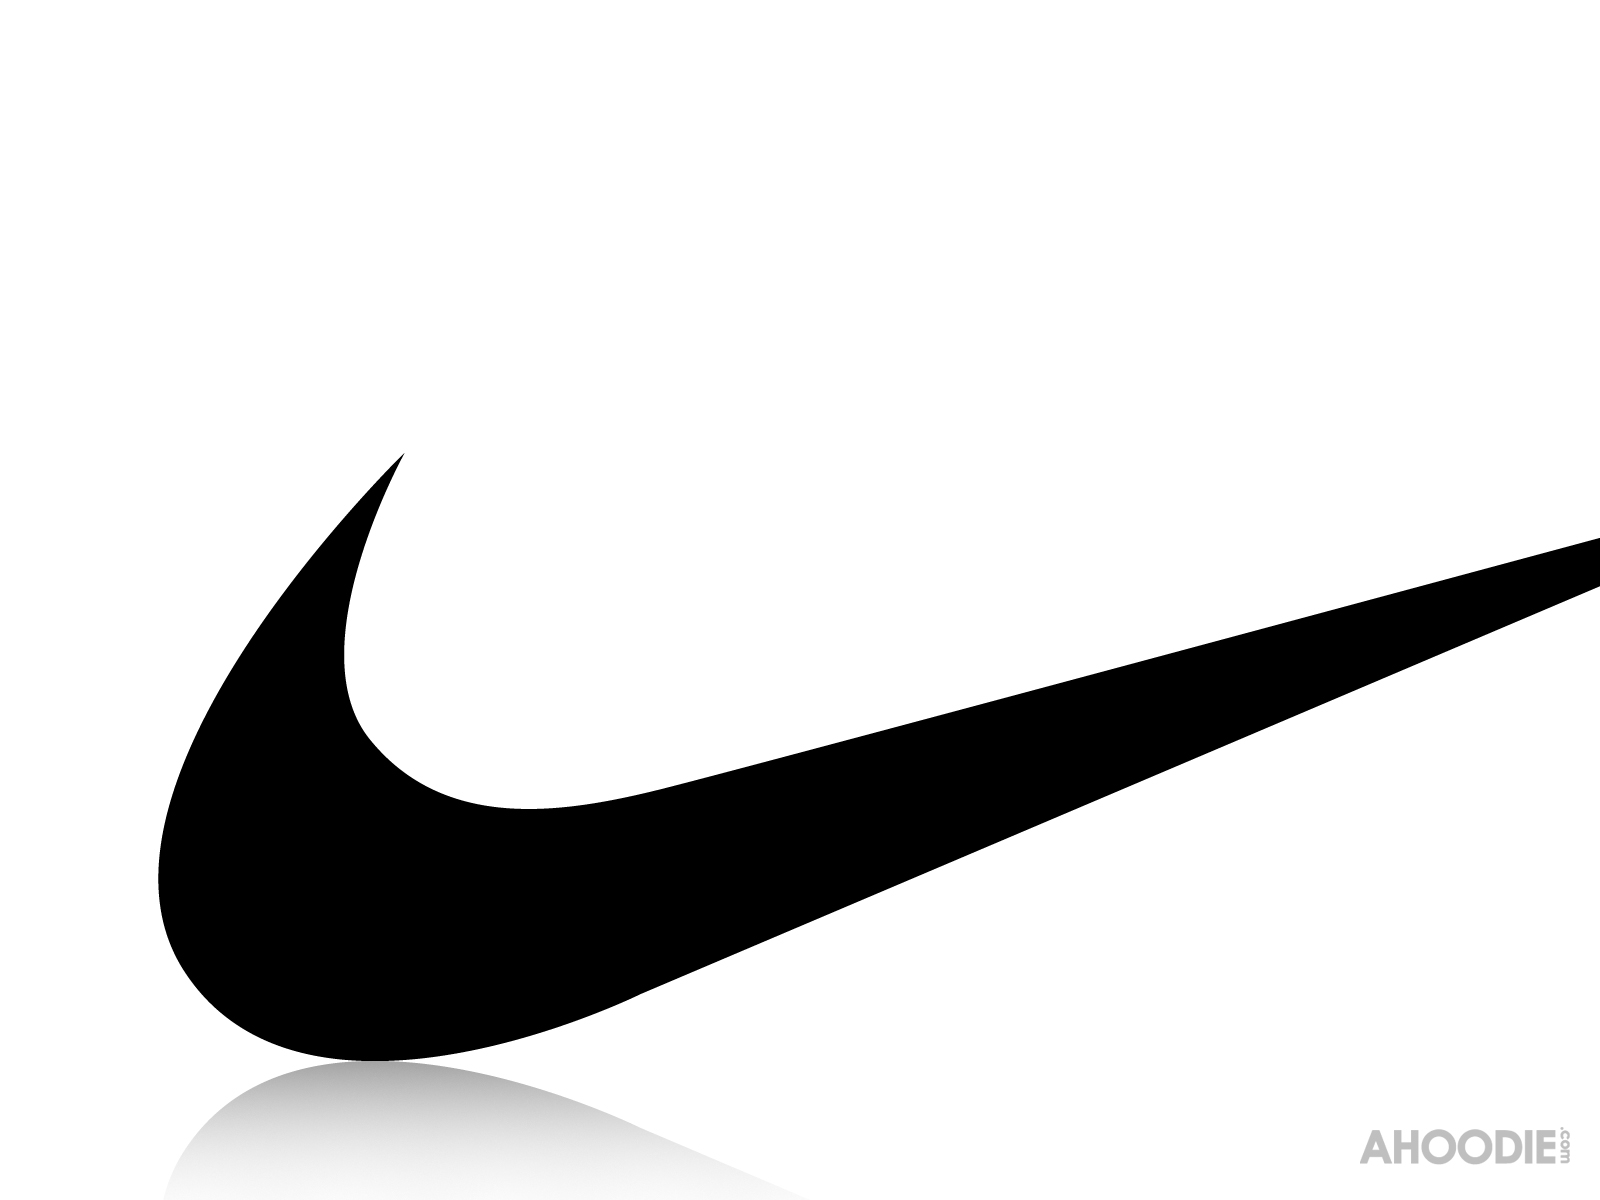 Nike Logo Clipart-Clipartlook.com-1600-Nike Logo Clipart-Clipartlook.com-1600-18